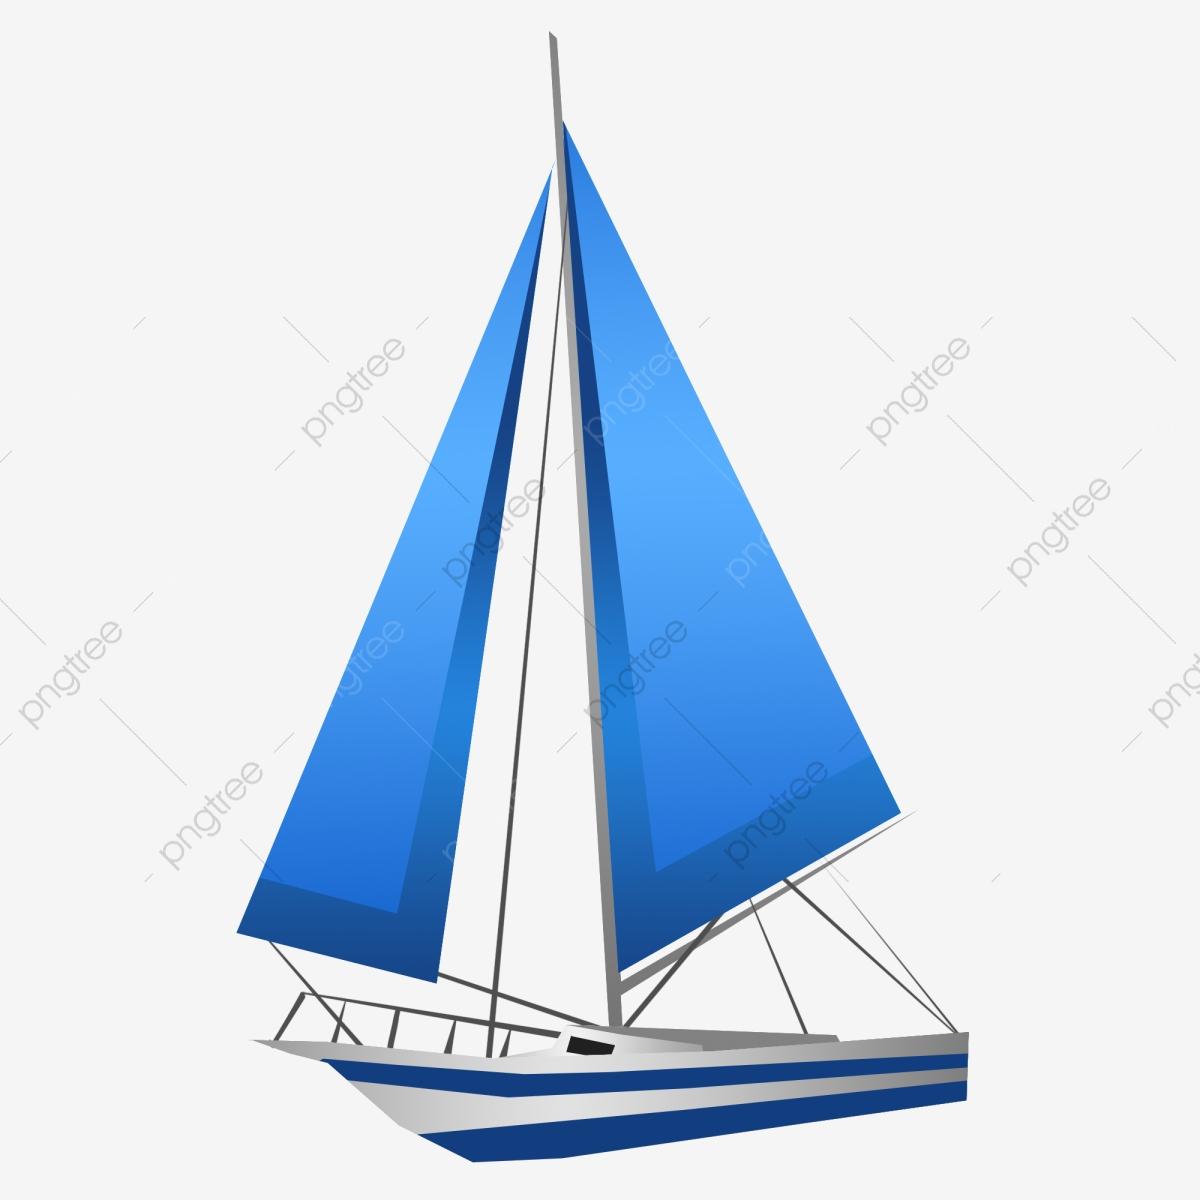 Cartoon Sailboat Blue Sailboat Illustration Blue Sail Start Sailing.